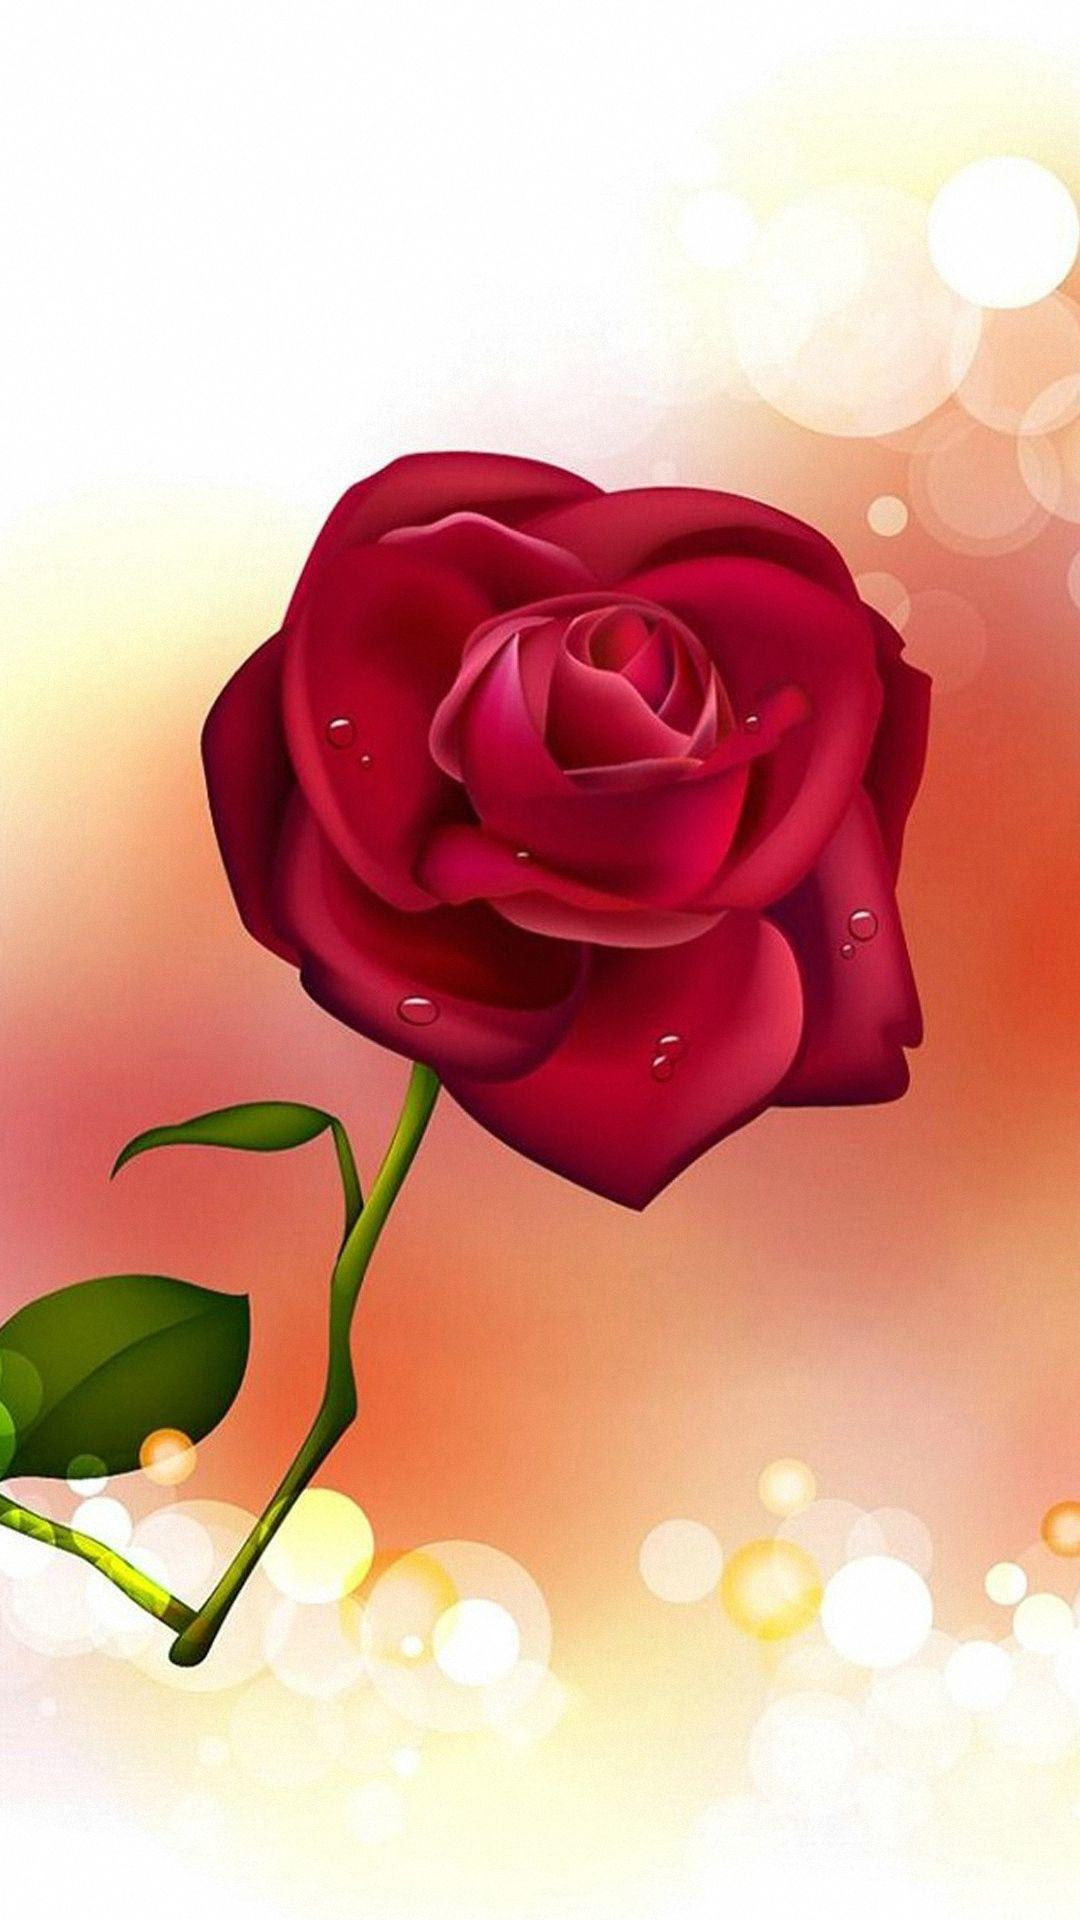 HD Rose Wallpapers For Mobile WallpaperPulse Rose